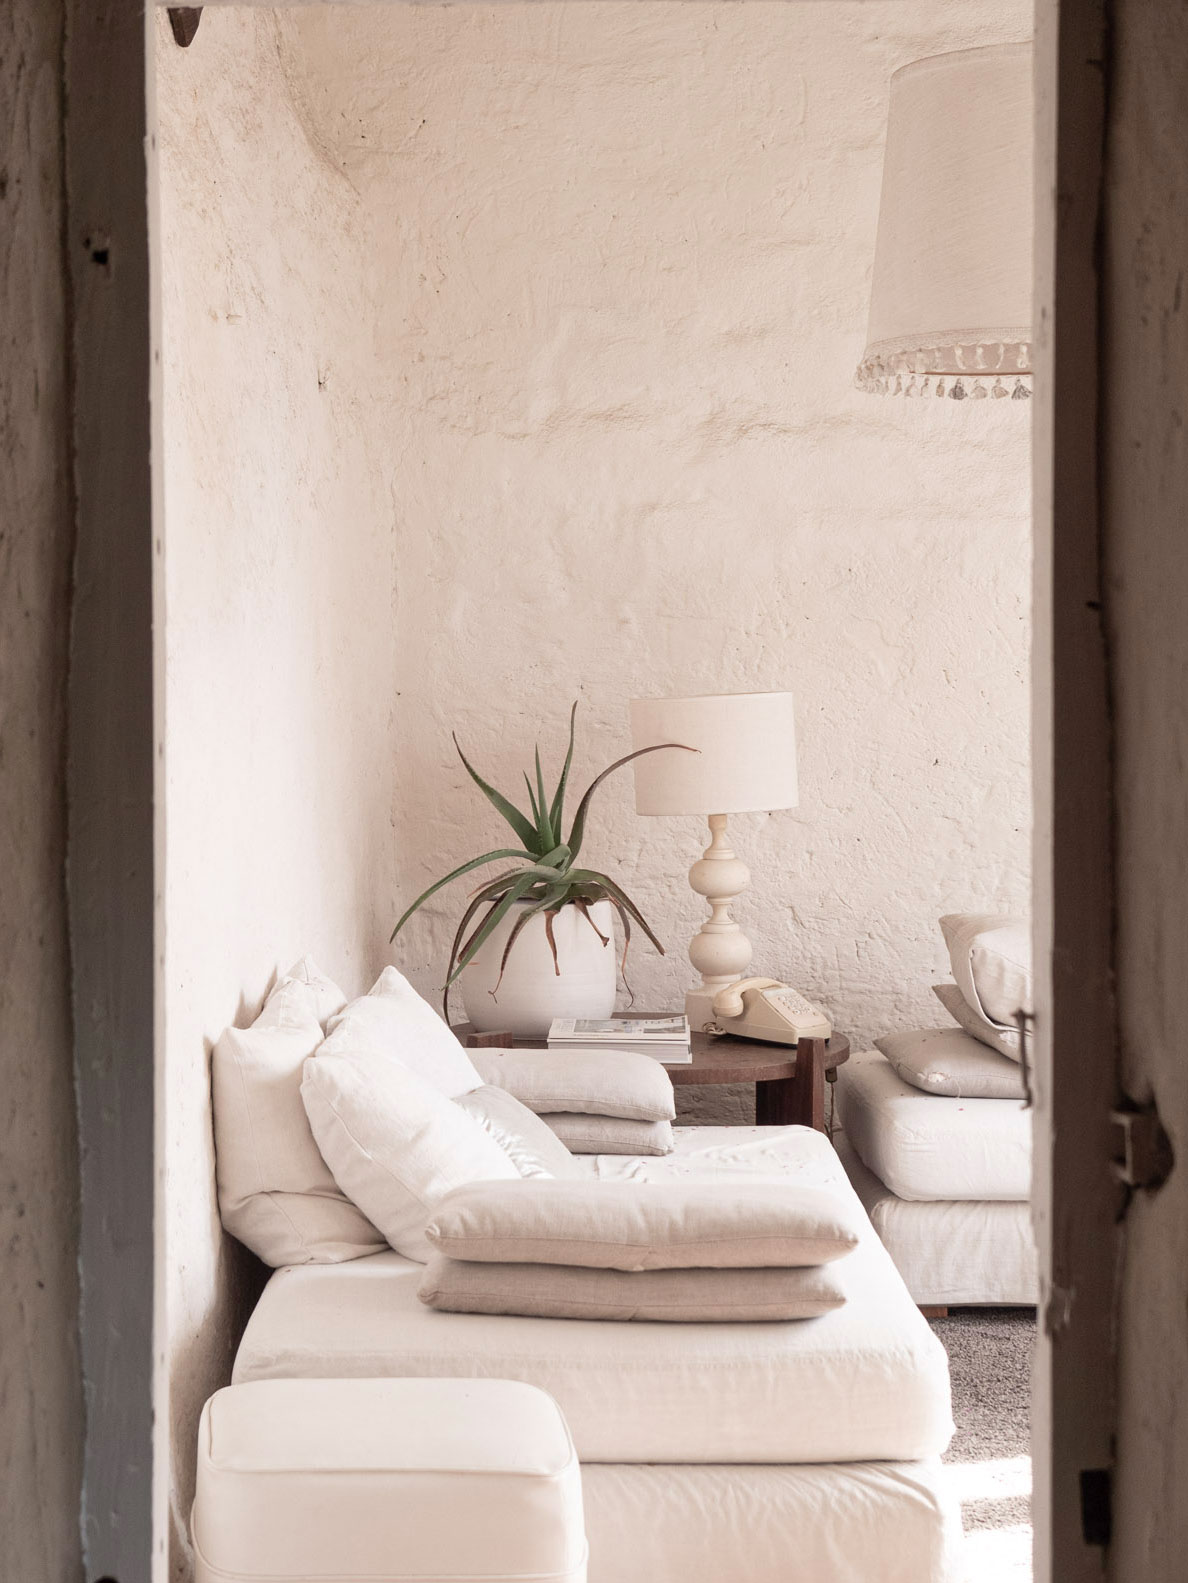 camellas-lloret-garden-apartment